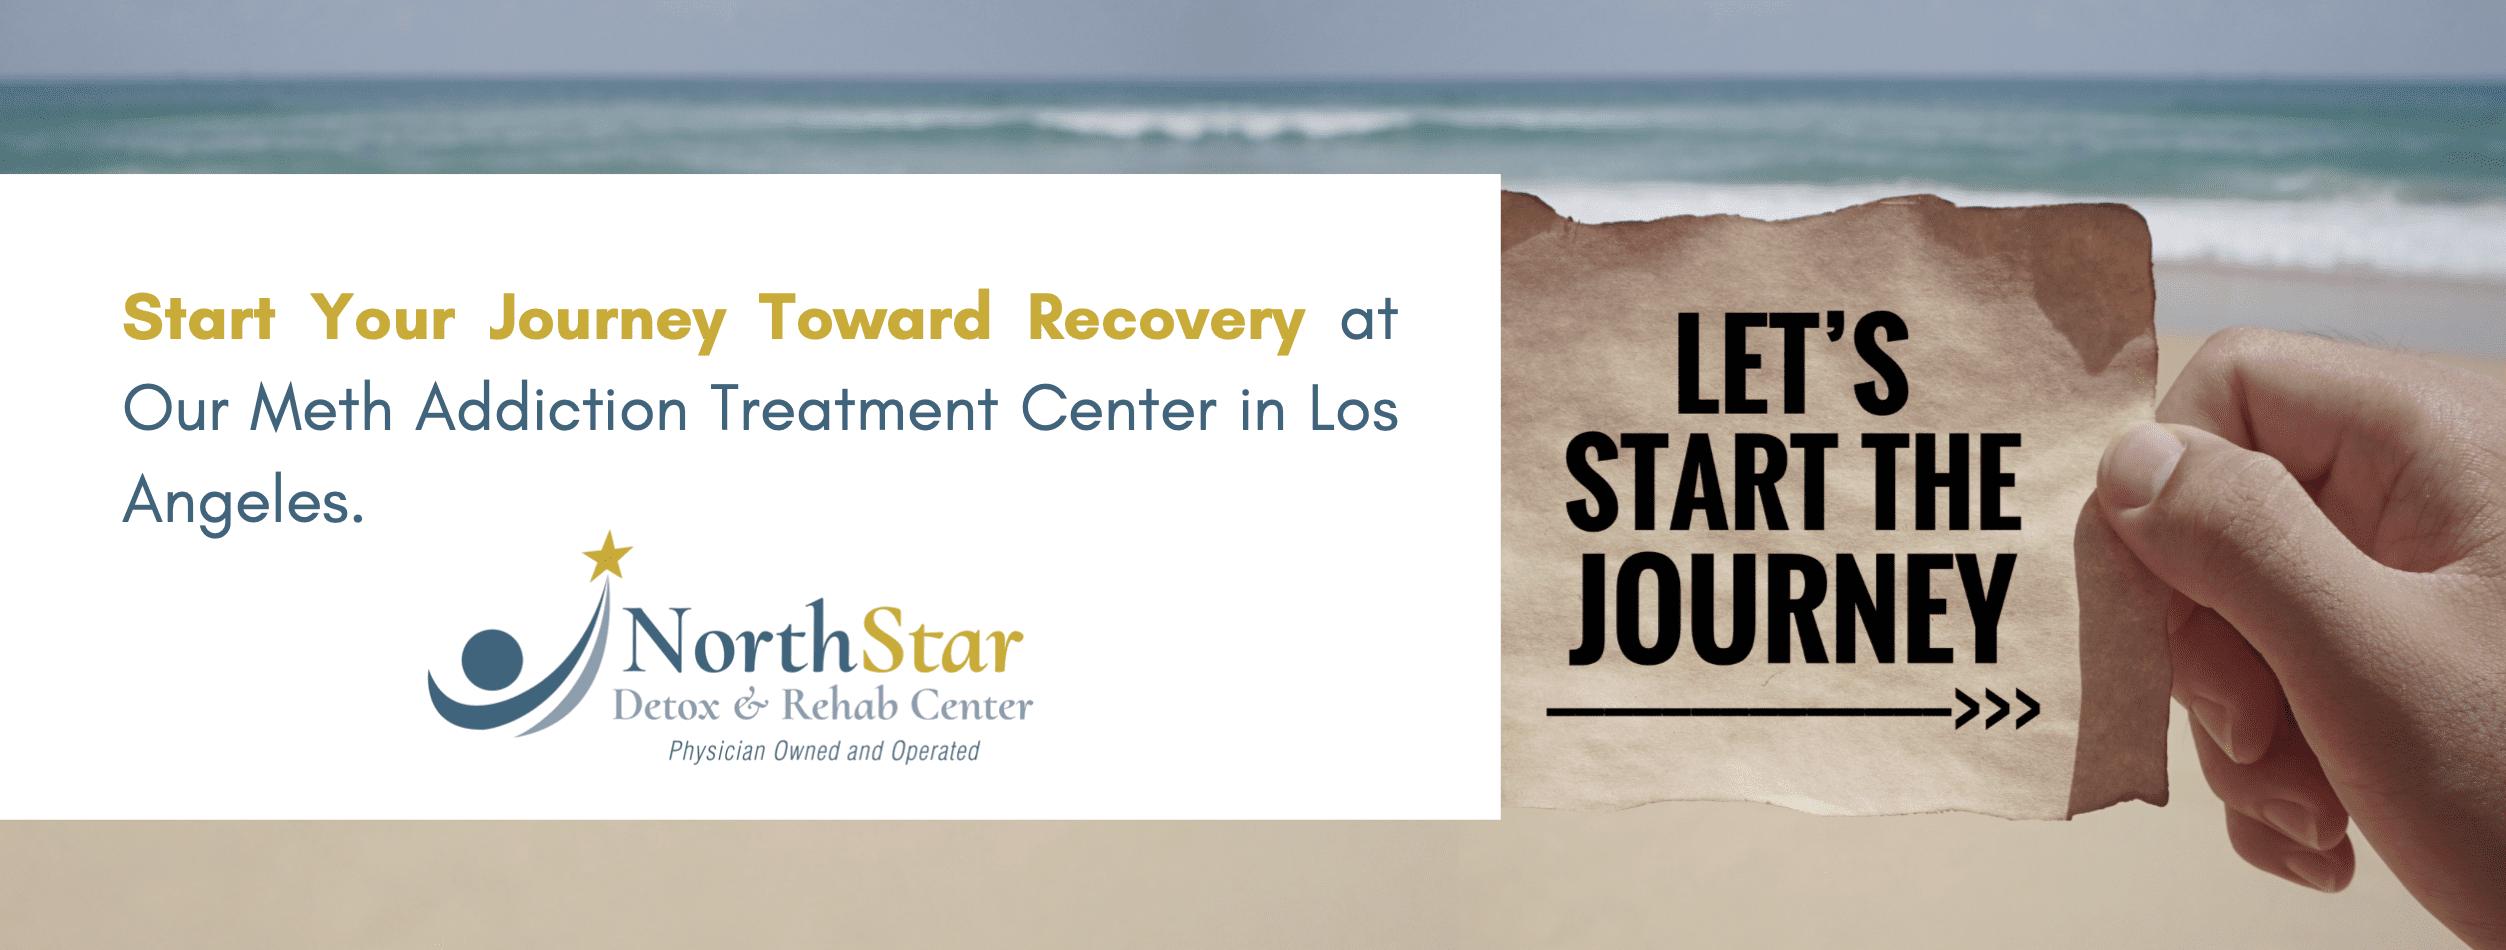 Meth Addiction Treatment Center LA California